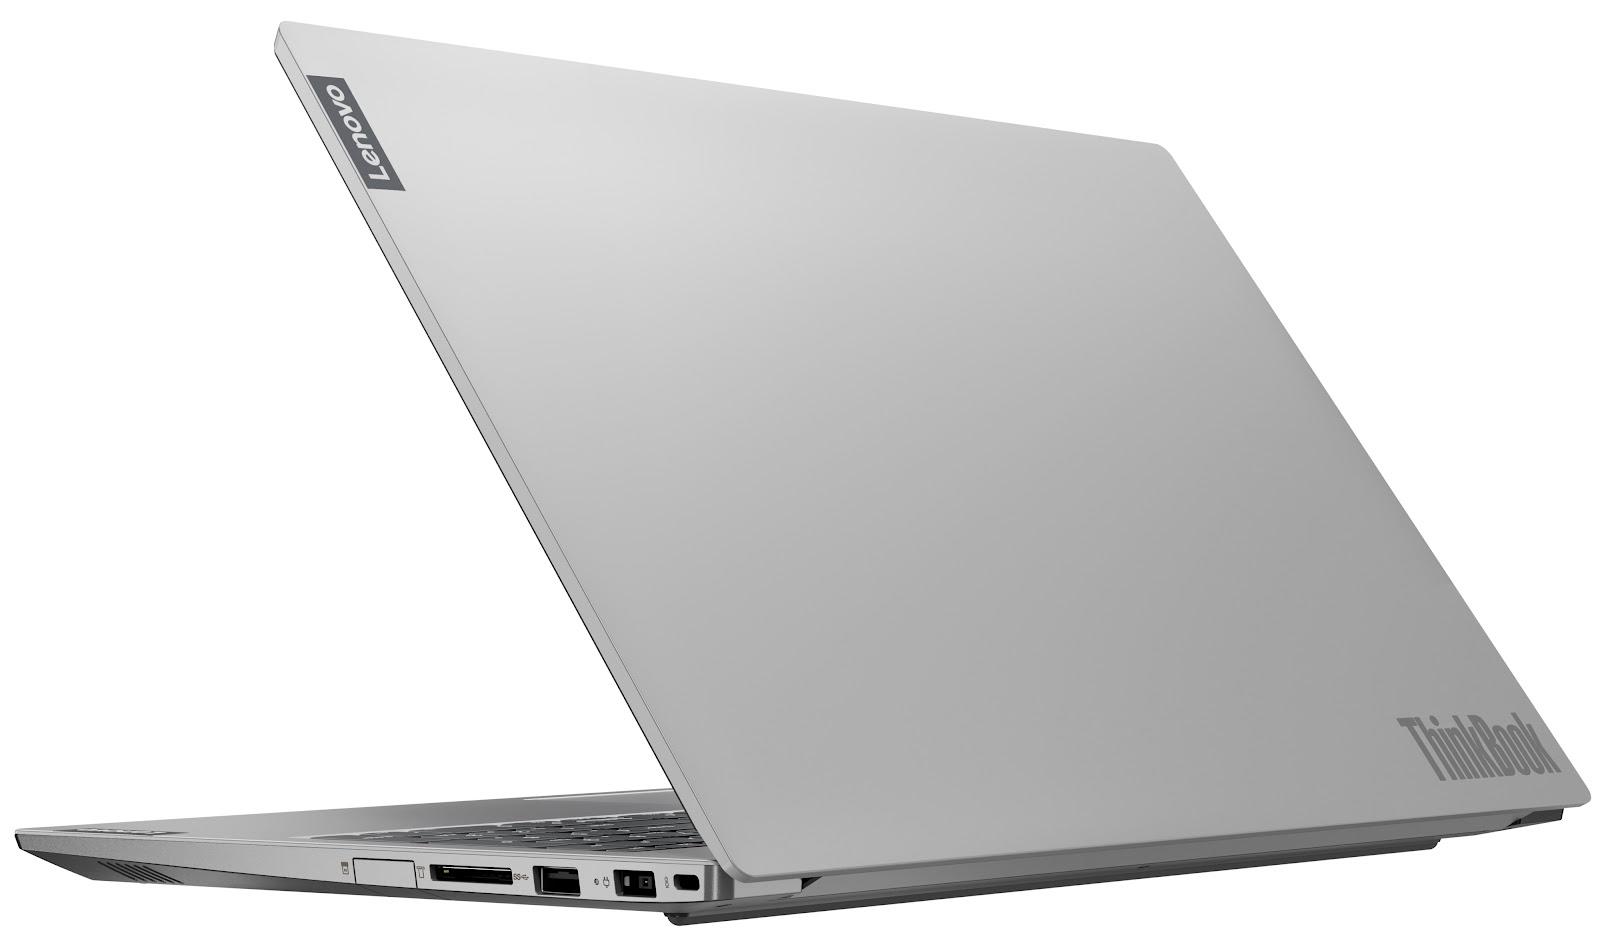 Фото 1. Ноутбук Lenovo ThinkBook 15-IIL (20SM009URU)